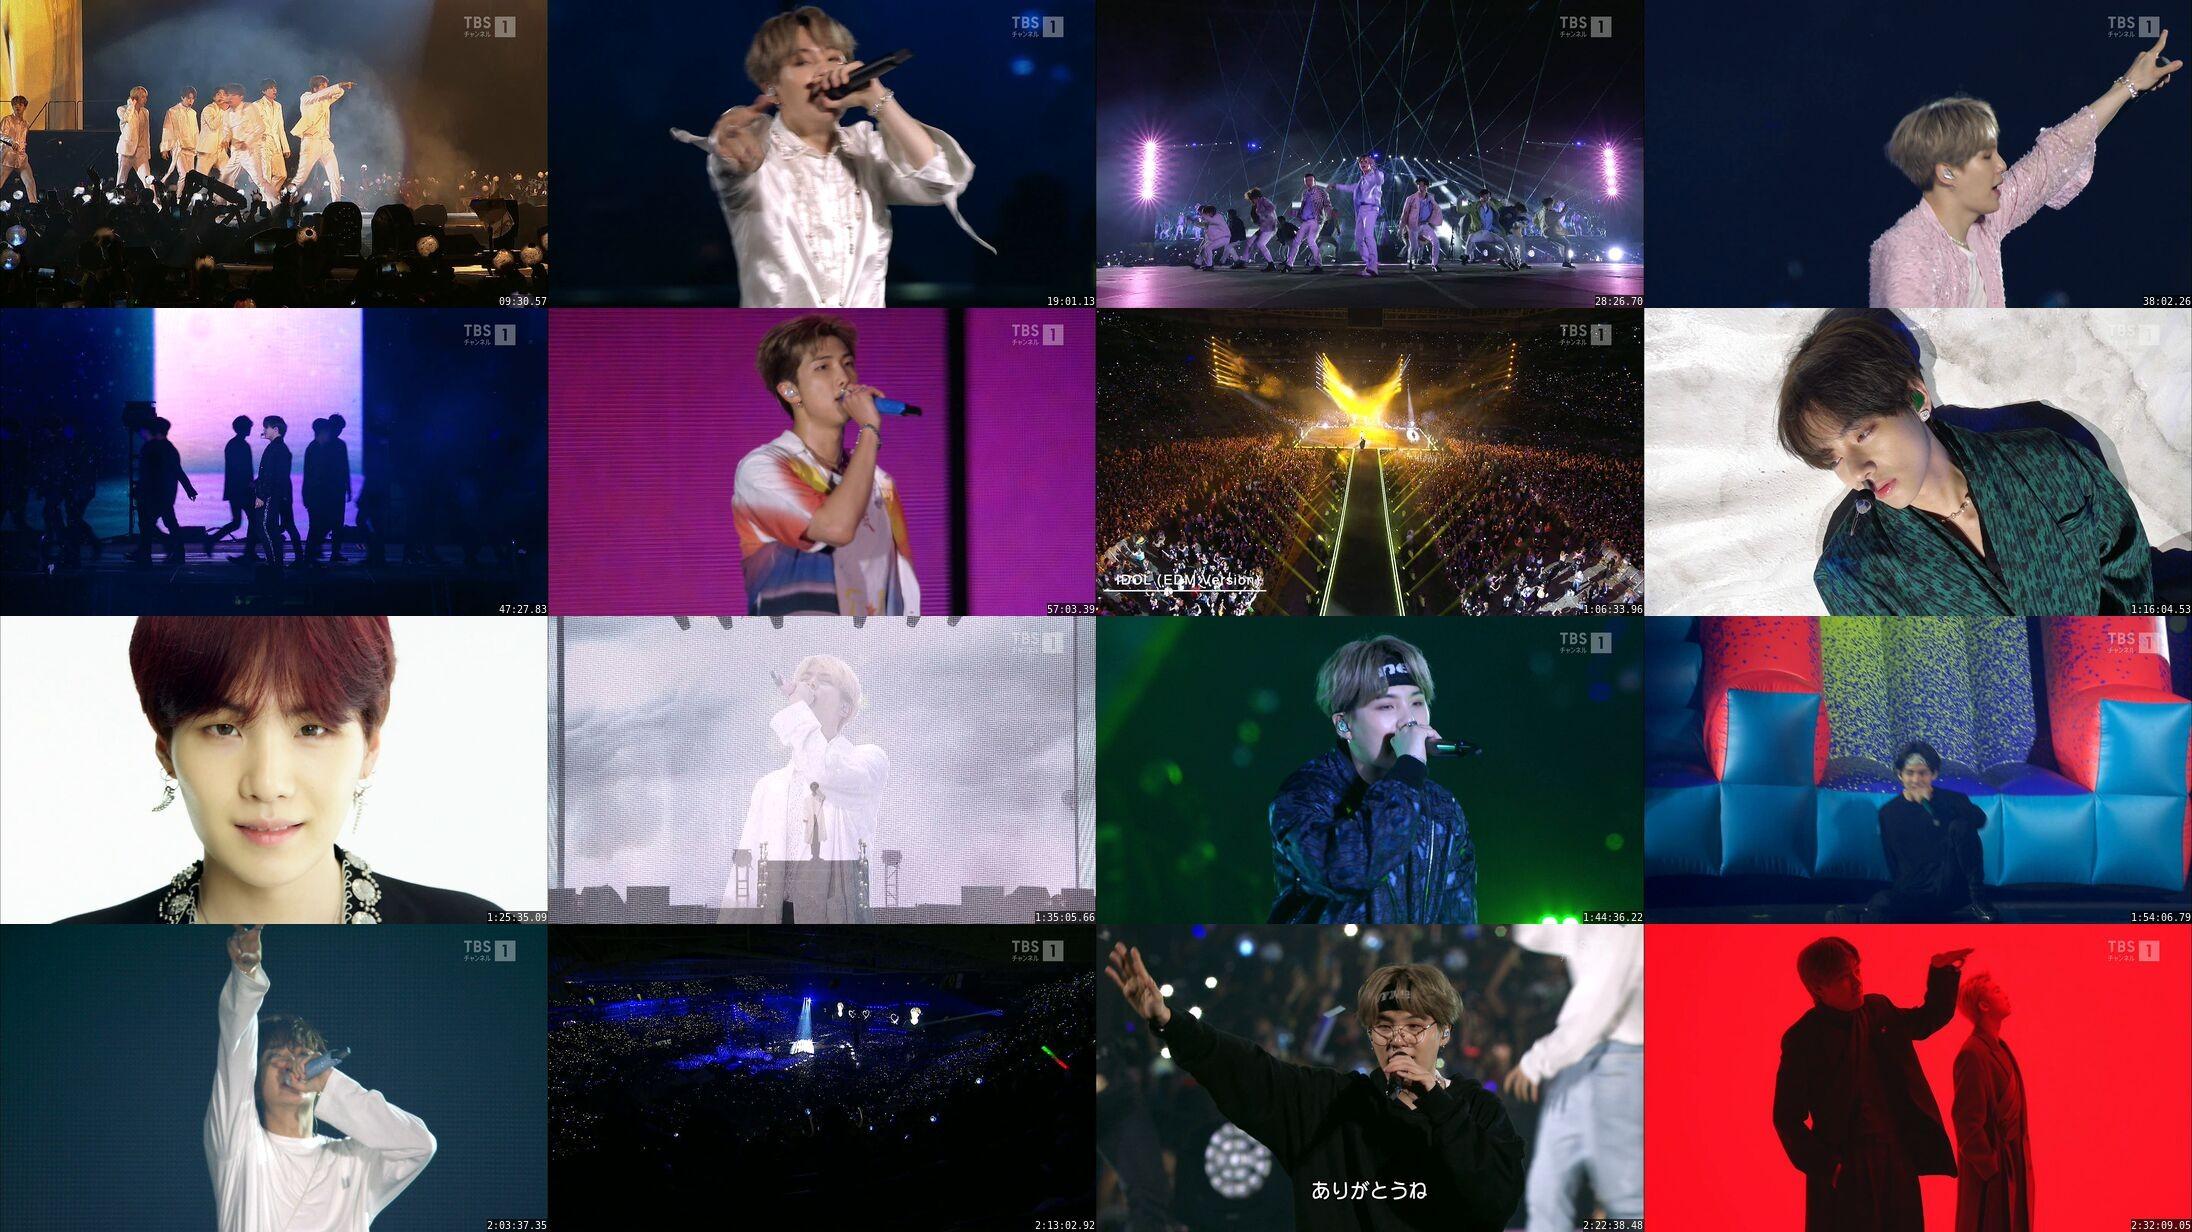 BTS – BTS WORLD TOUR 'LOVE YOURSELF: SPEAK YOURSELF' SAO PAULO [MPEG2 / 1080i / HDTV]  (TBS Channel 1 2020.07.25)